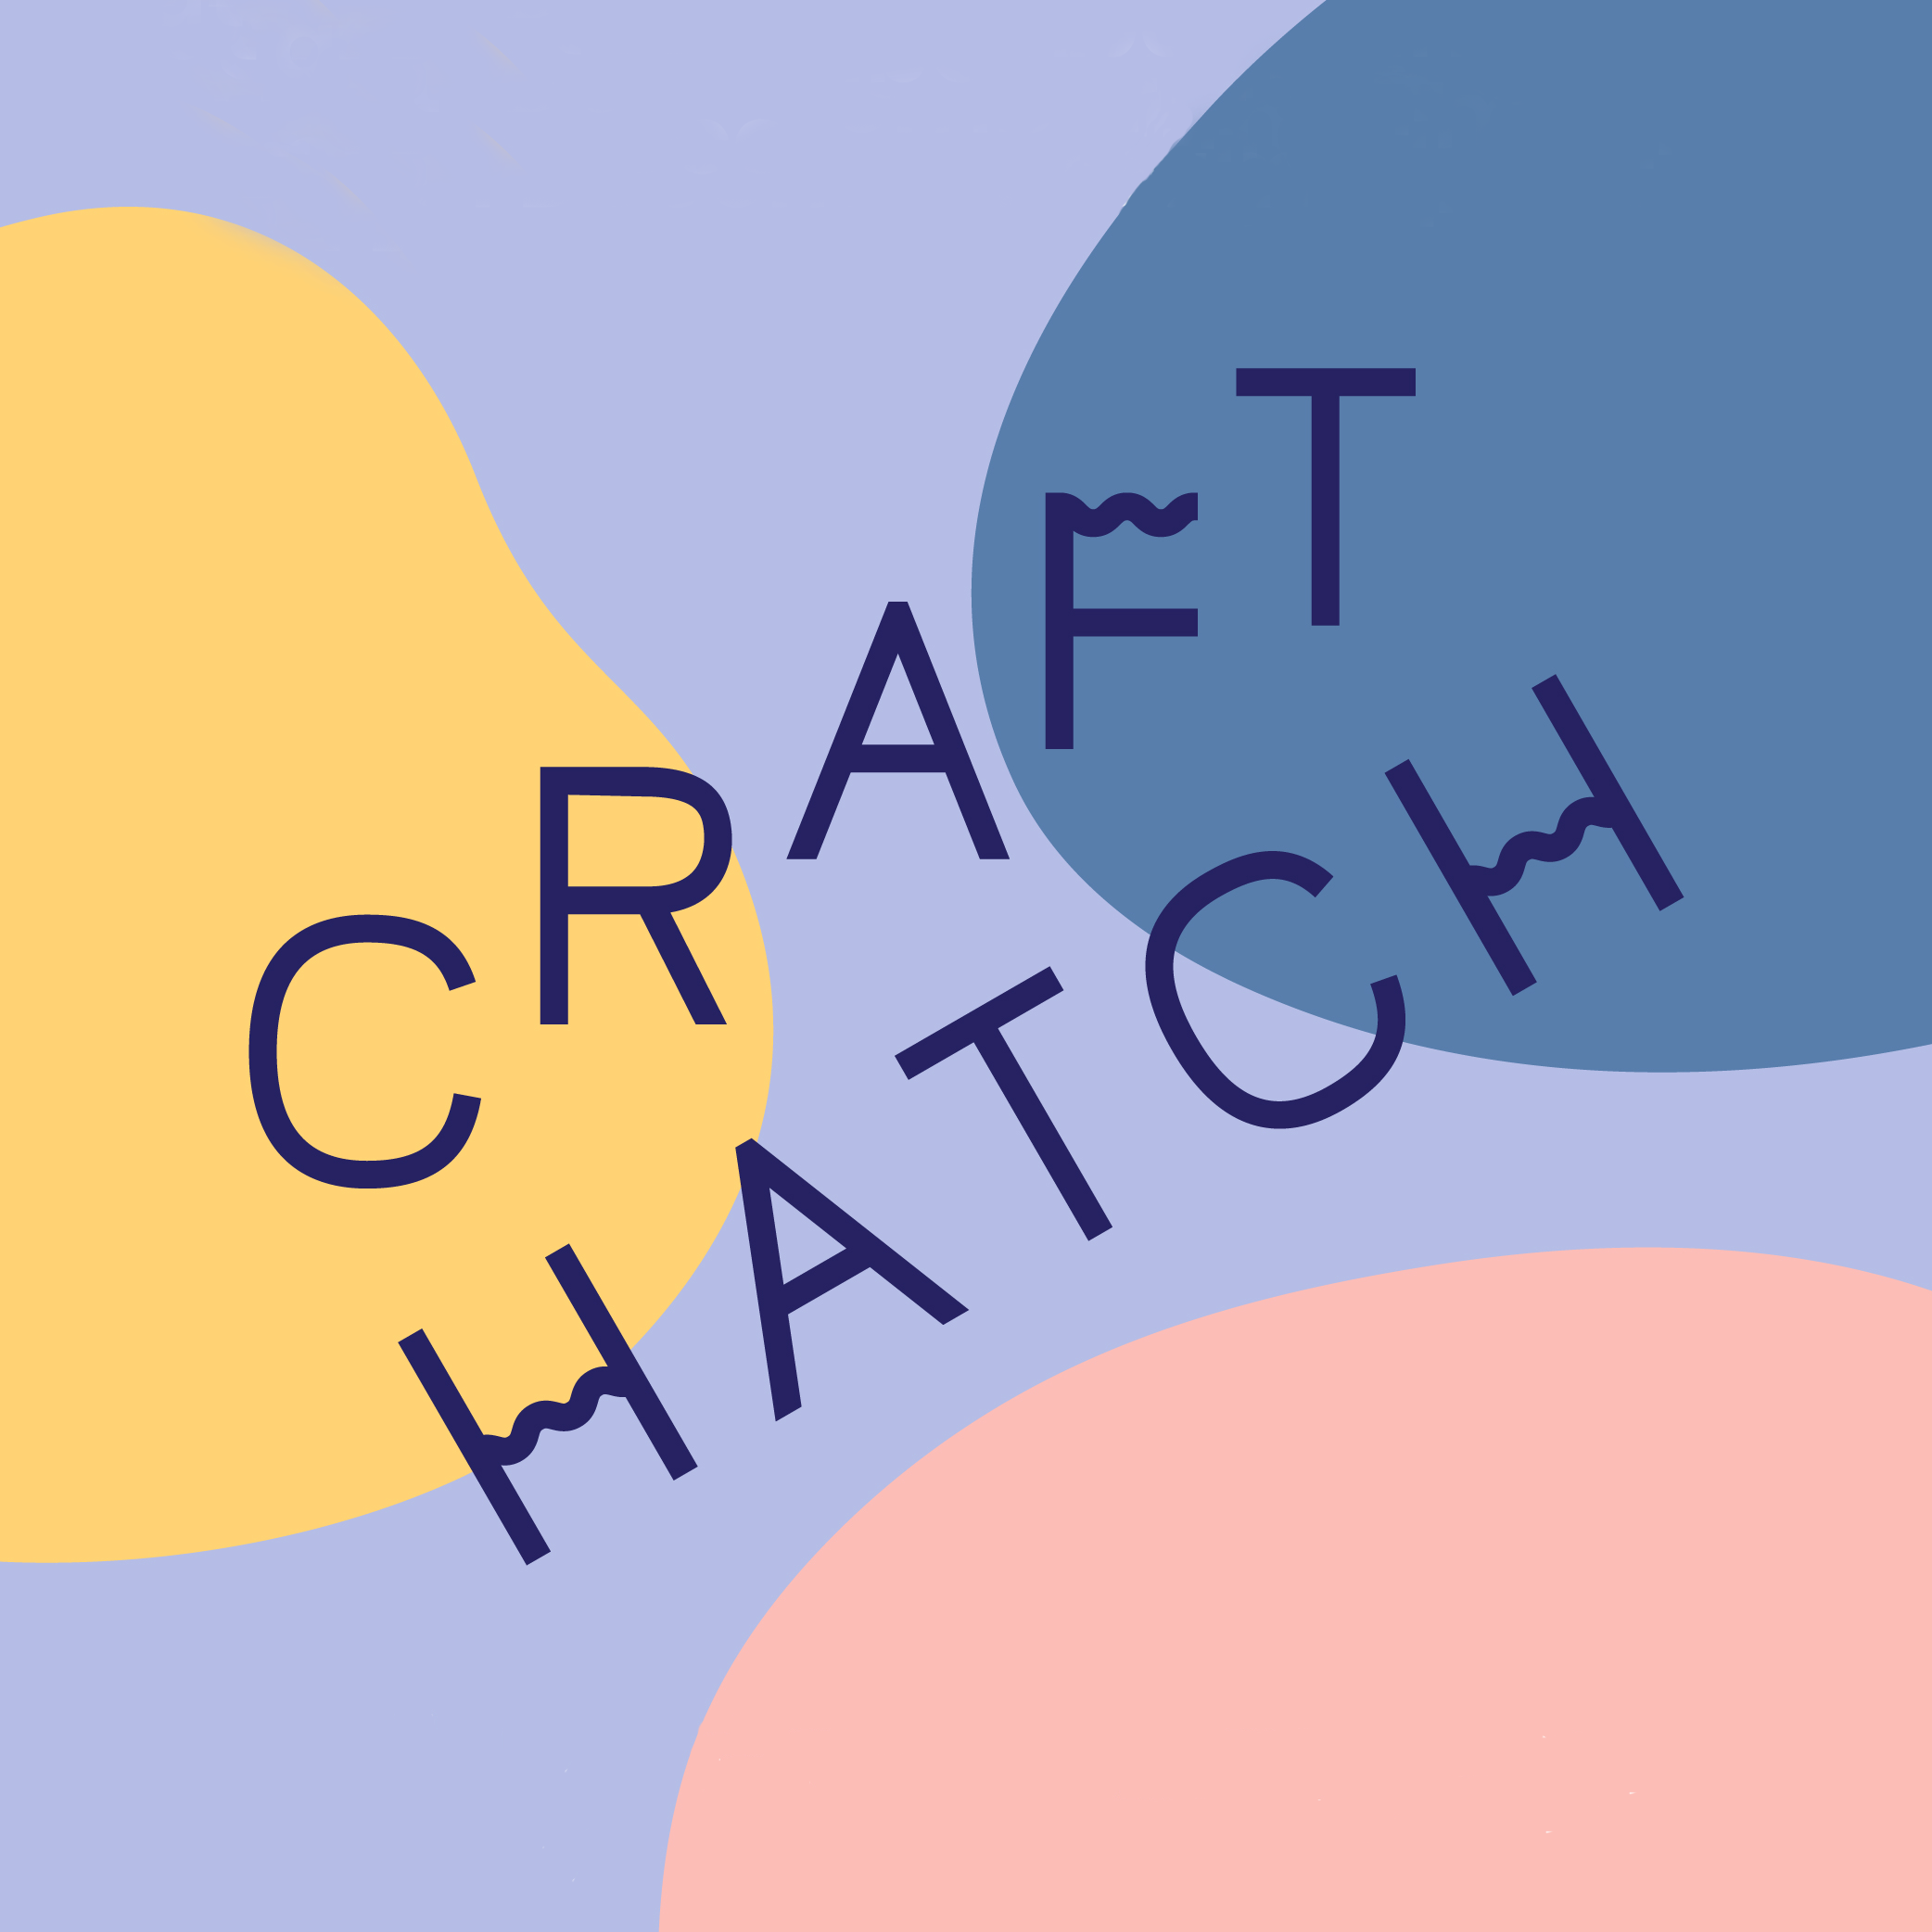 Craft_Hatch_2018_SocialMedia_Insta1new.png